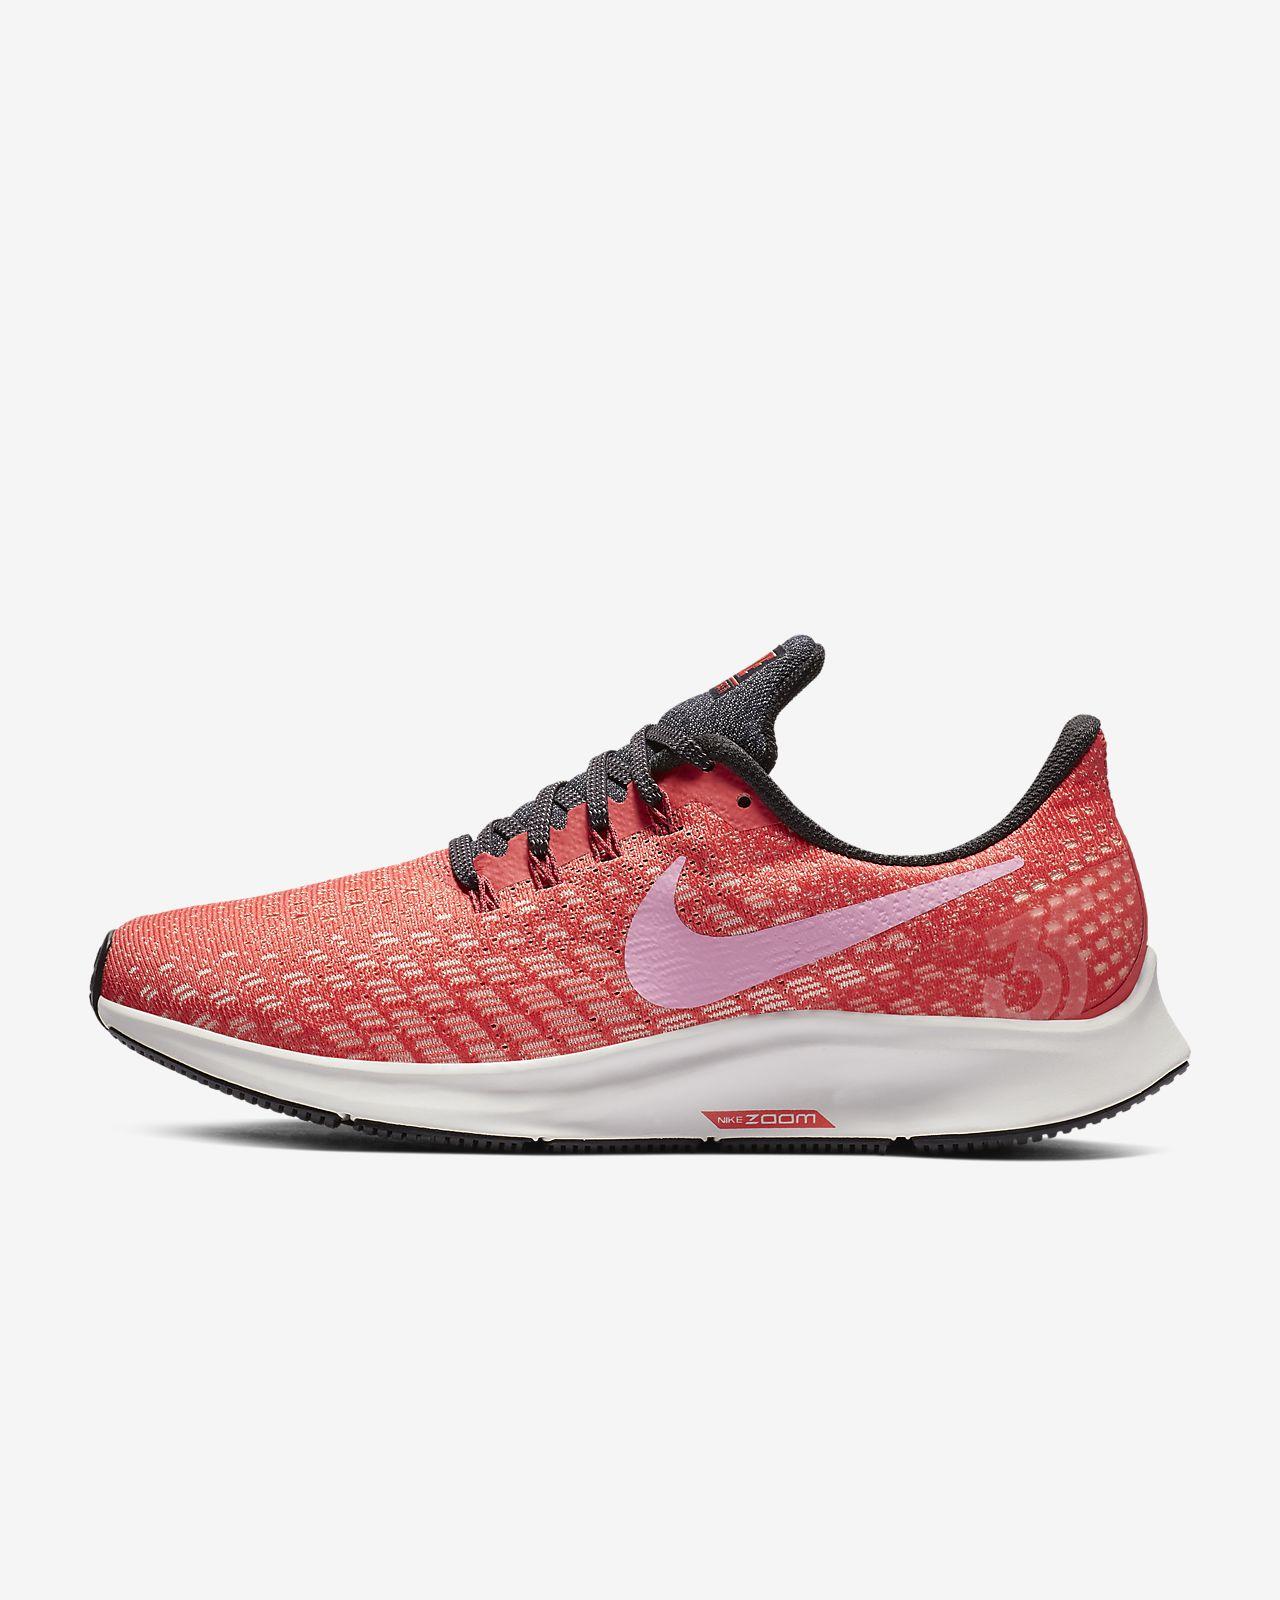 competitive price stable quality hot sale Nike Air Zoom Pegasus 35 løpesko til dame